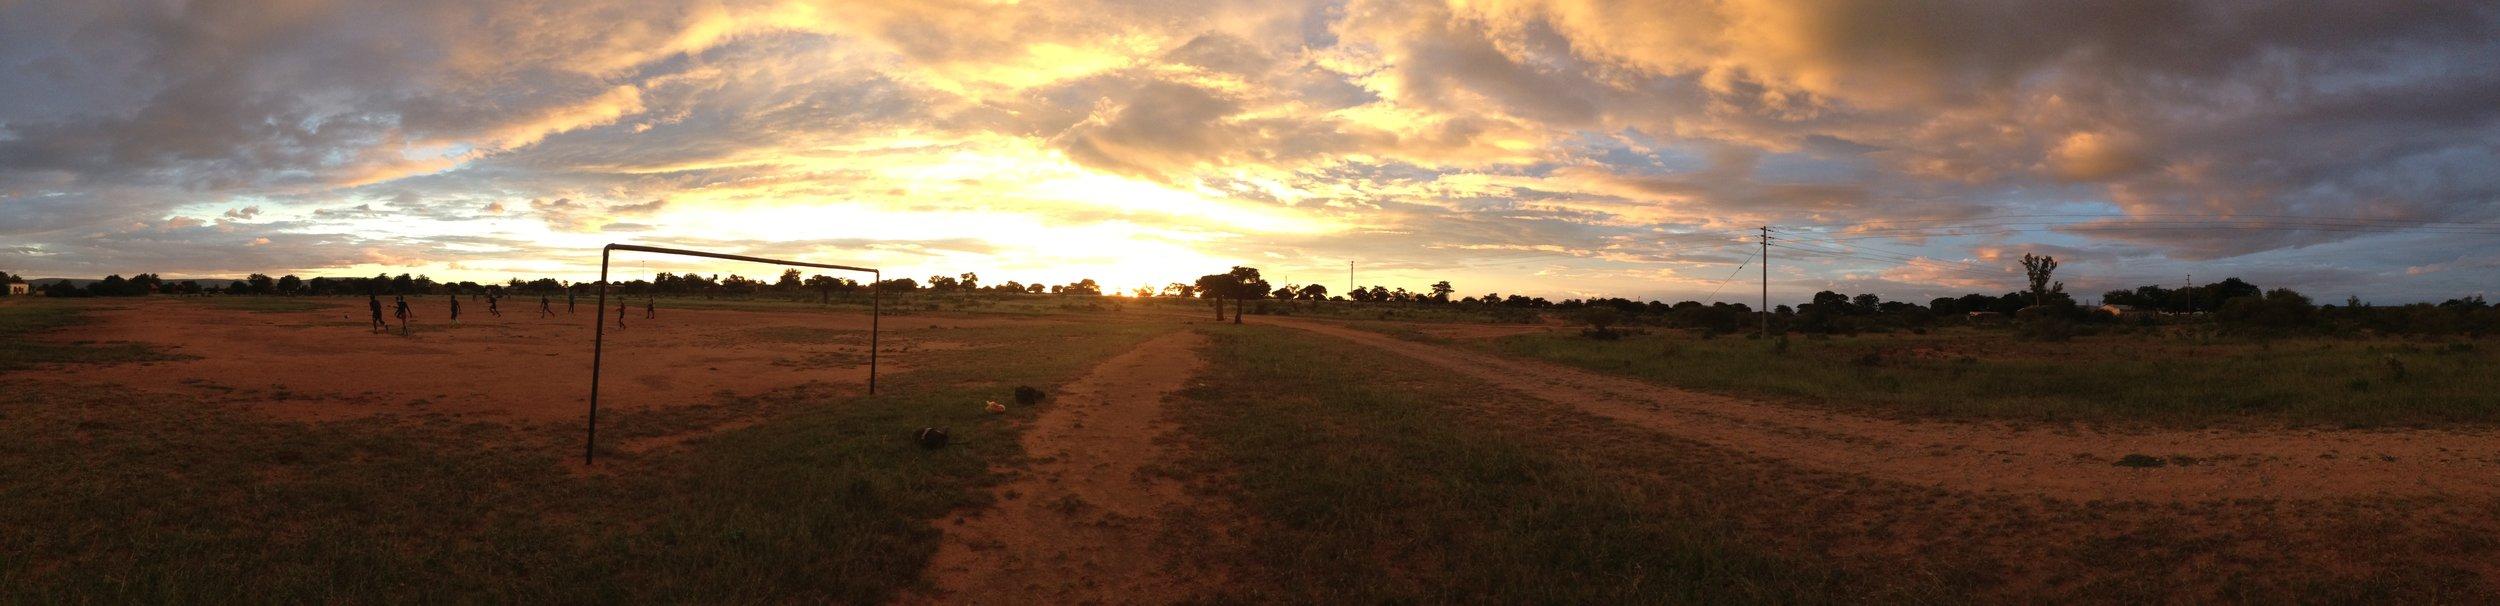 Sets -  Mpumalanga Province, South Africa